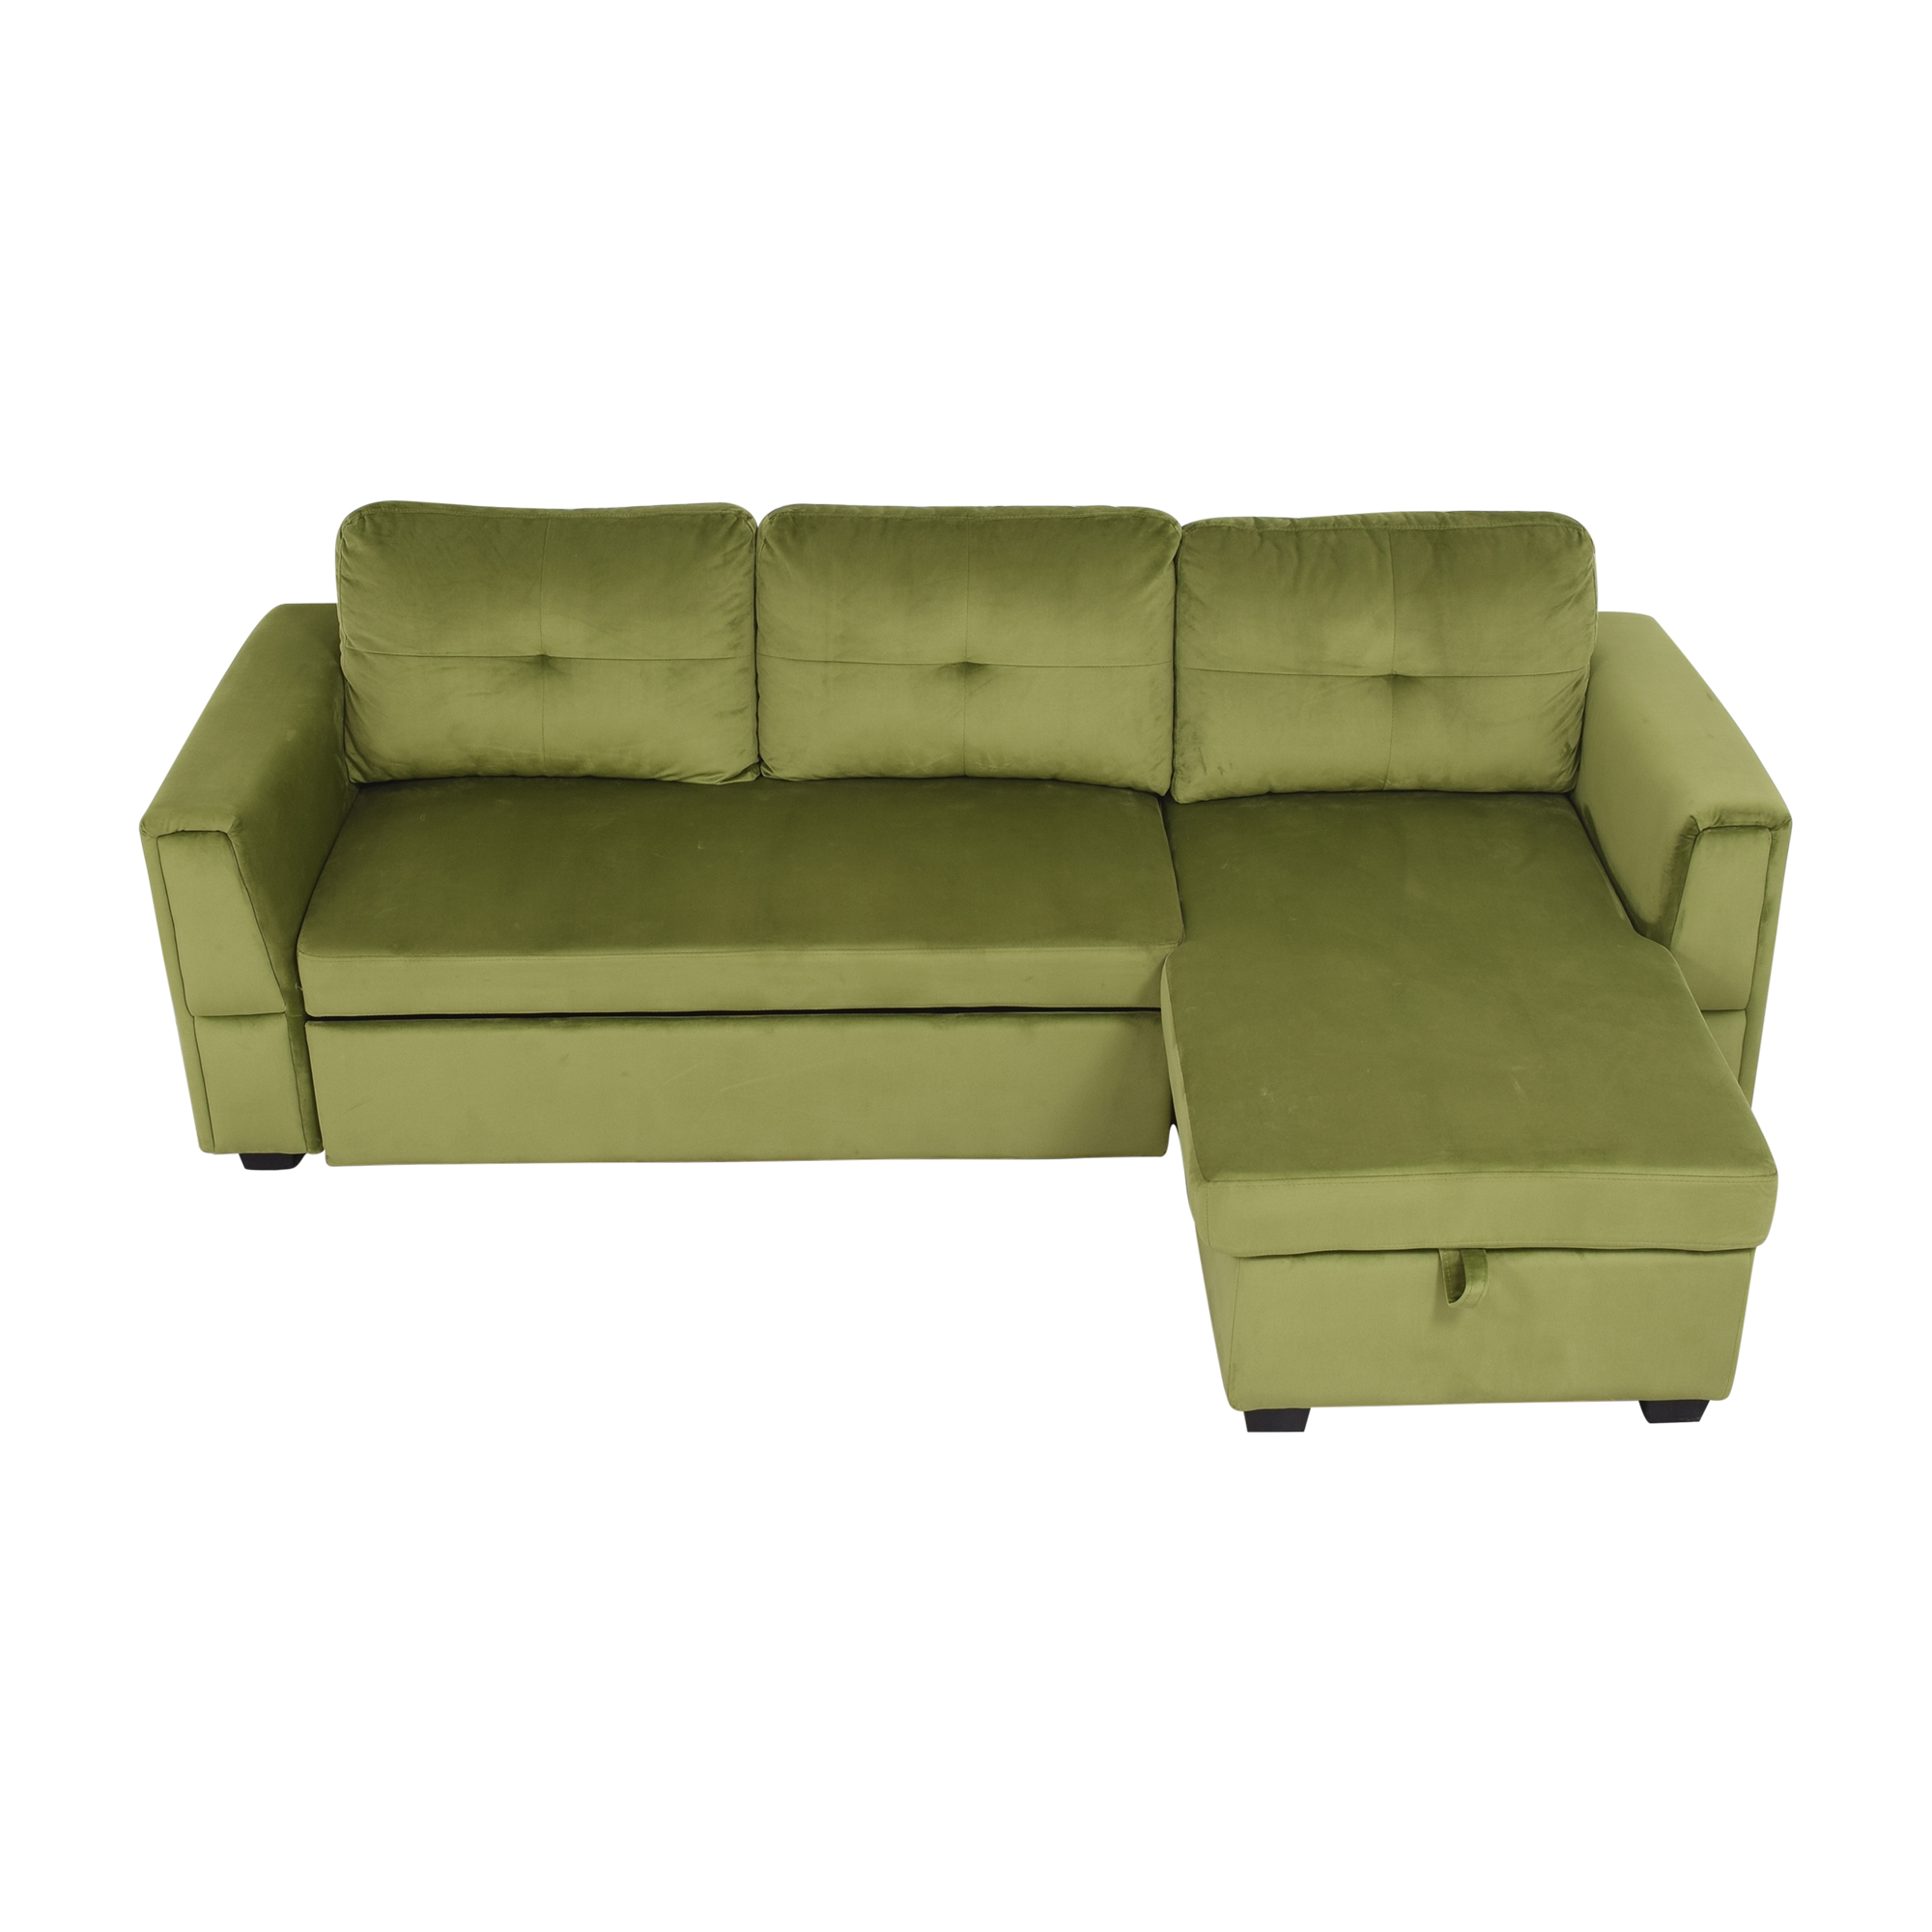 buy Wayfair Mercer41 Nelda Round Arm Sleeper Sofa Wayfair Sofas